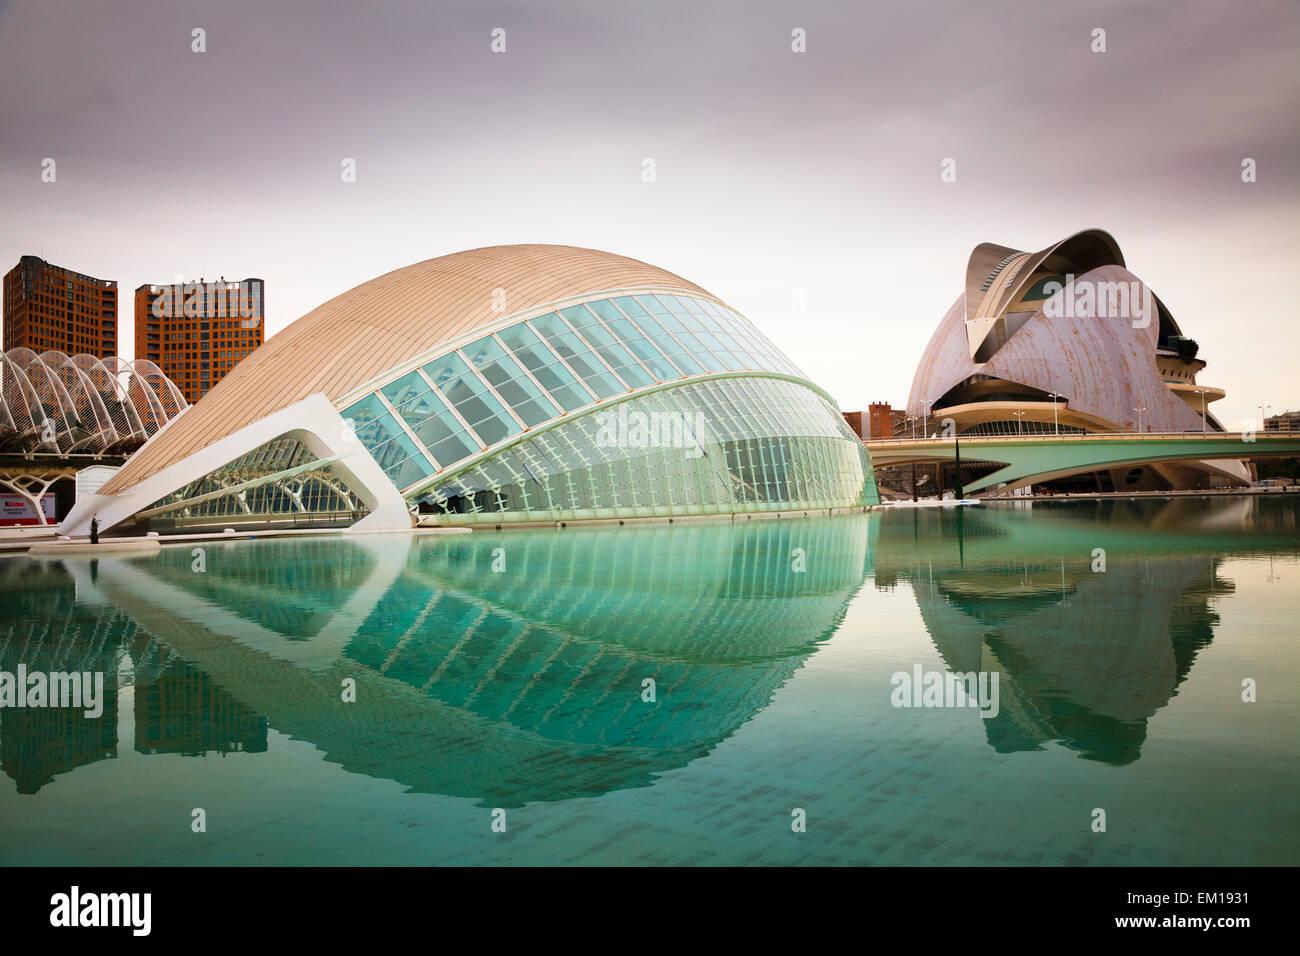 Exterior of the Hemisferic and Palau de les Arts Reina Sofia in Valencia spain - Stock Image